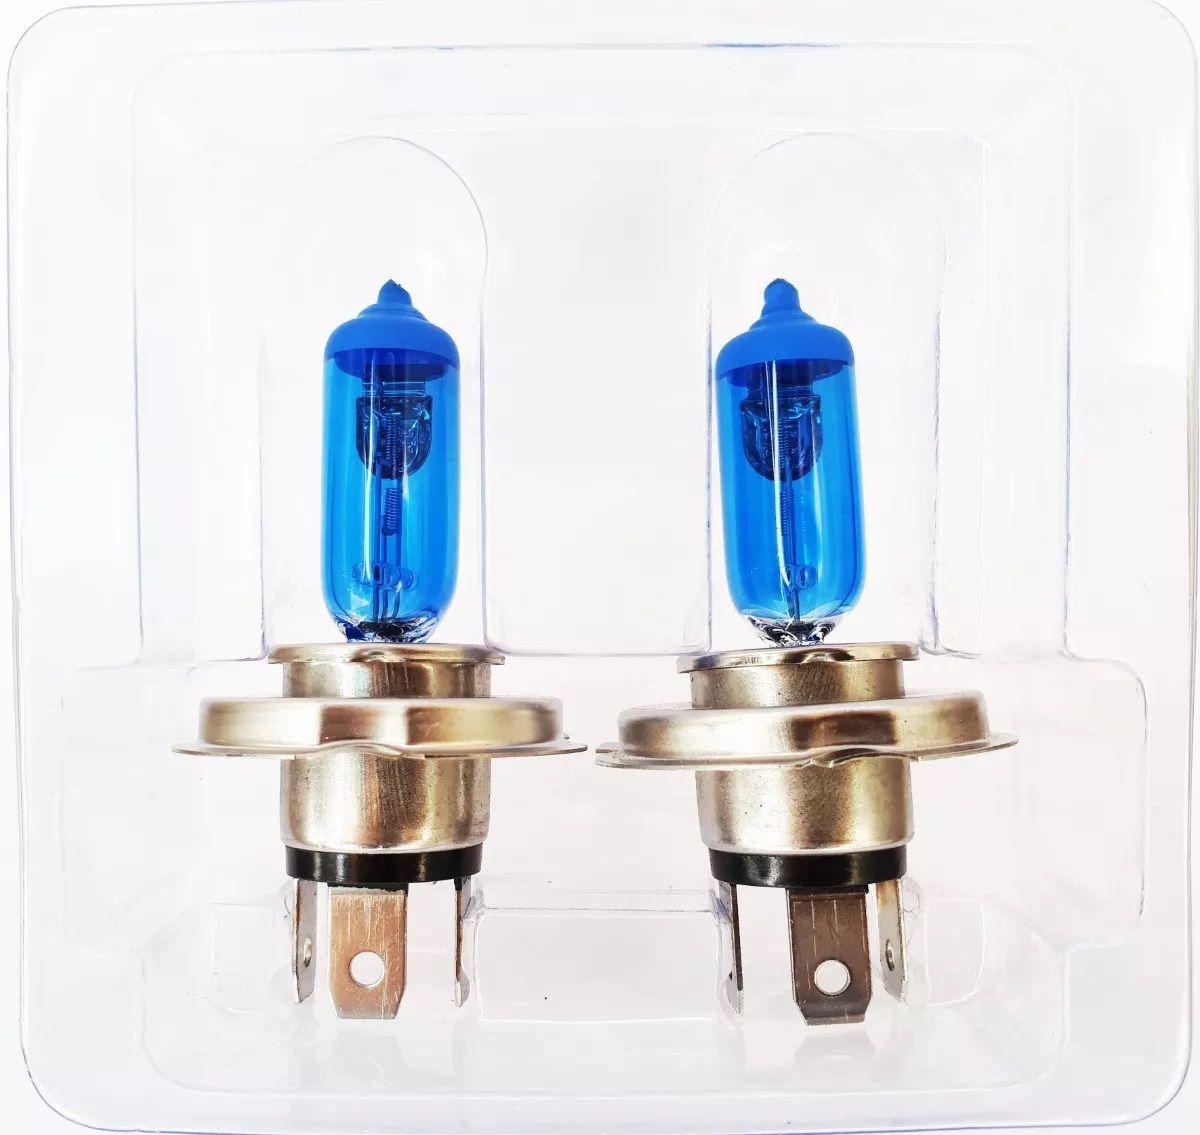 Par Lâmpada Super Branca H4 55w 12v Efeito Xenon Premium Inmetro